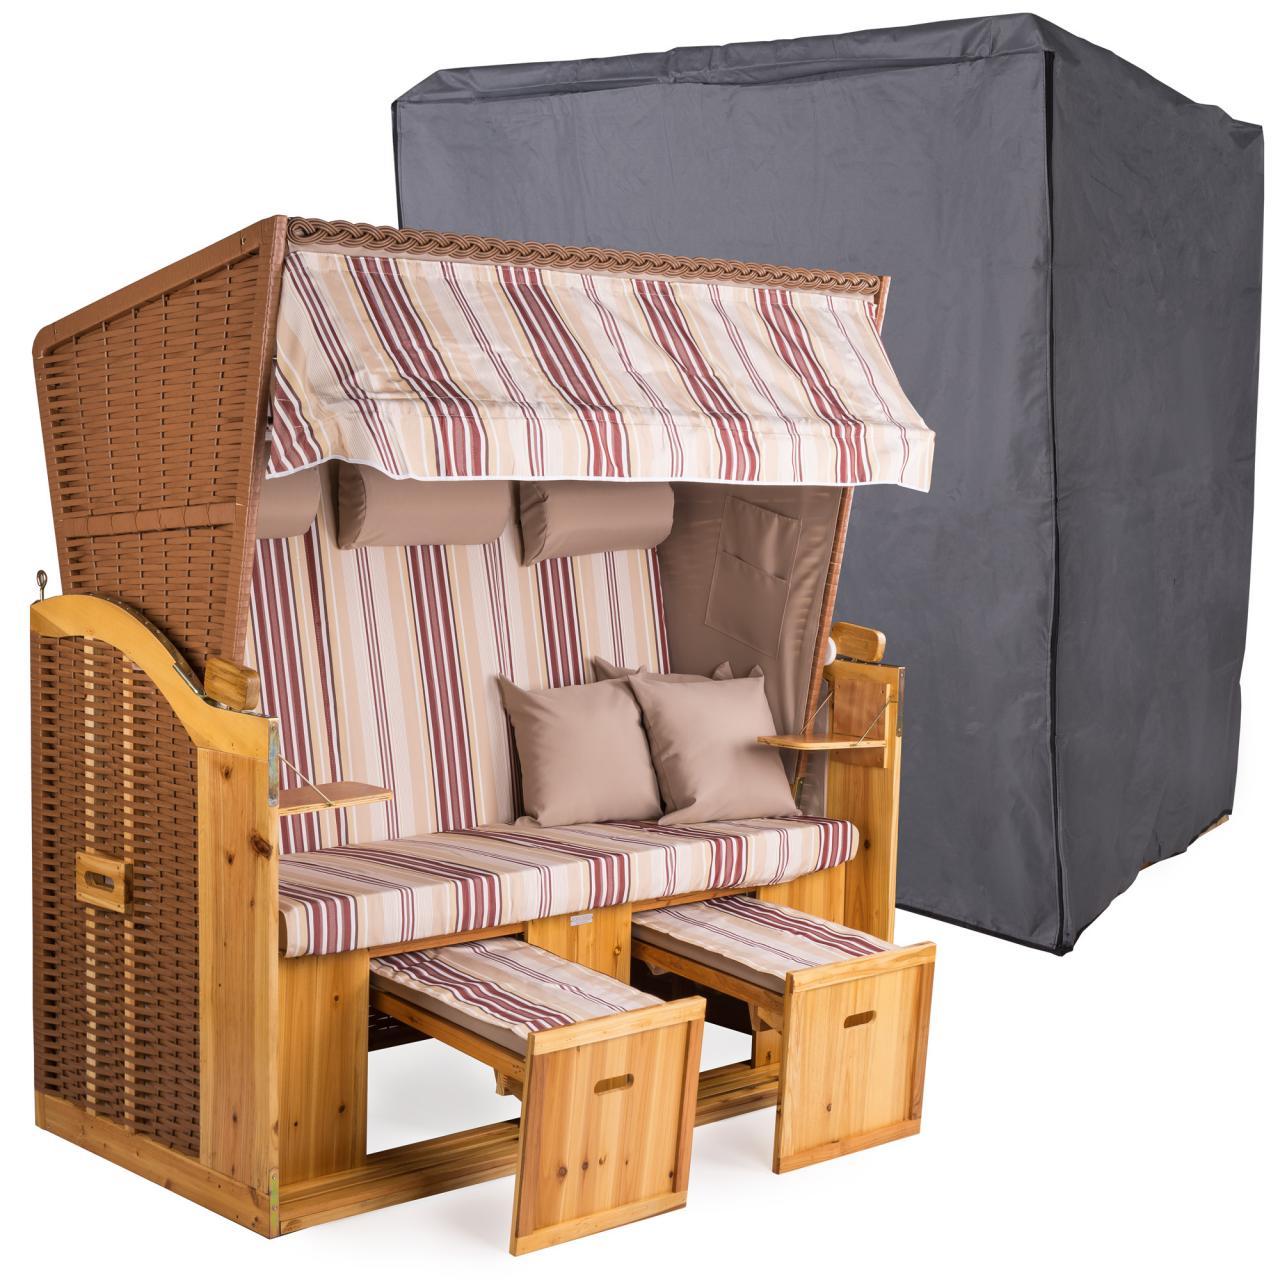 strandkorb xxl deluxe 160cm mit schutzh lle 600d. Black Bedroom Furniture Sets. Home Design Ideas